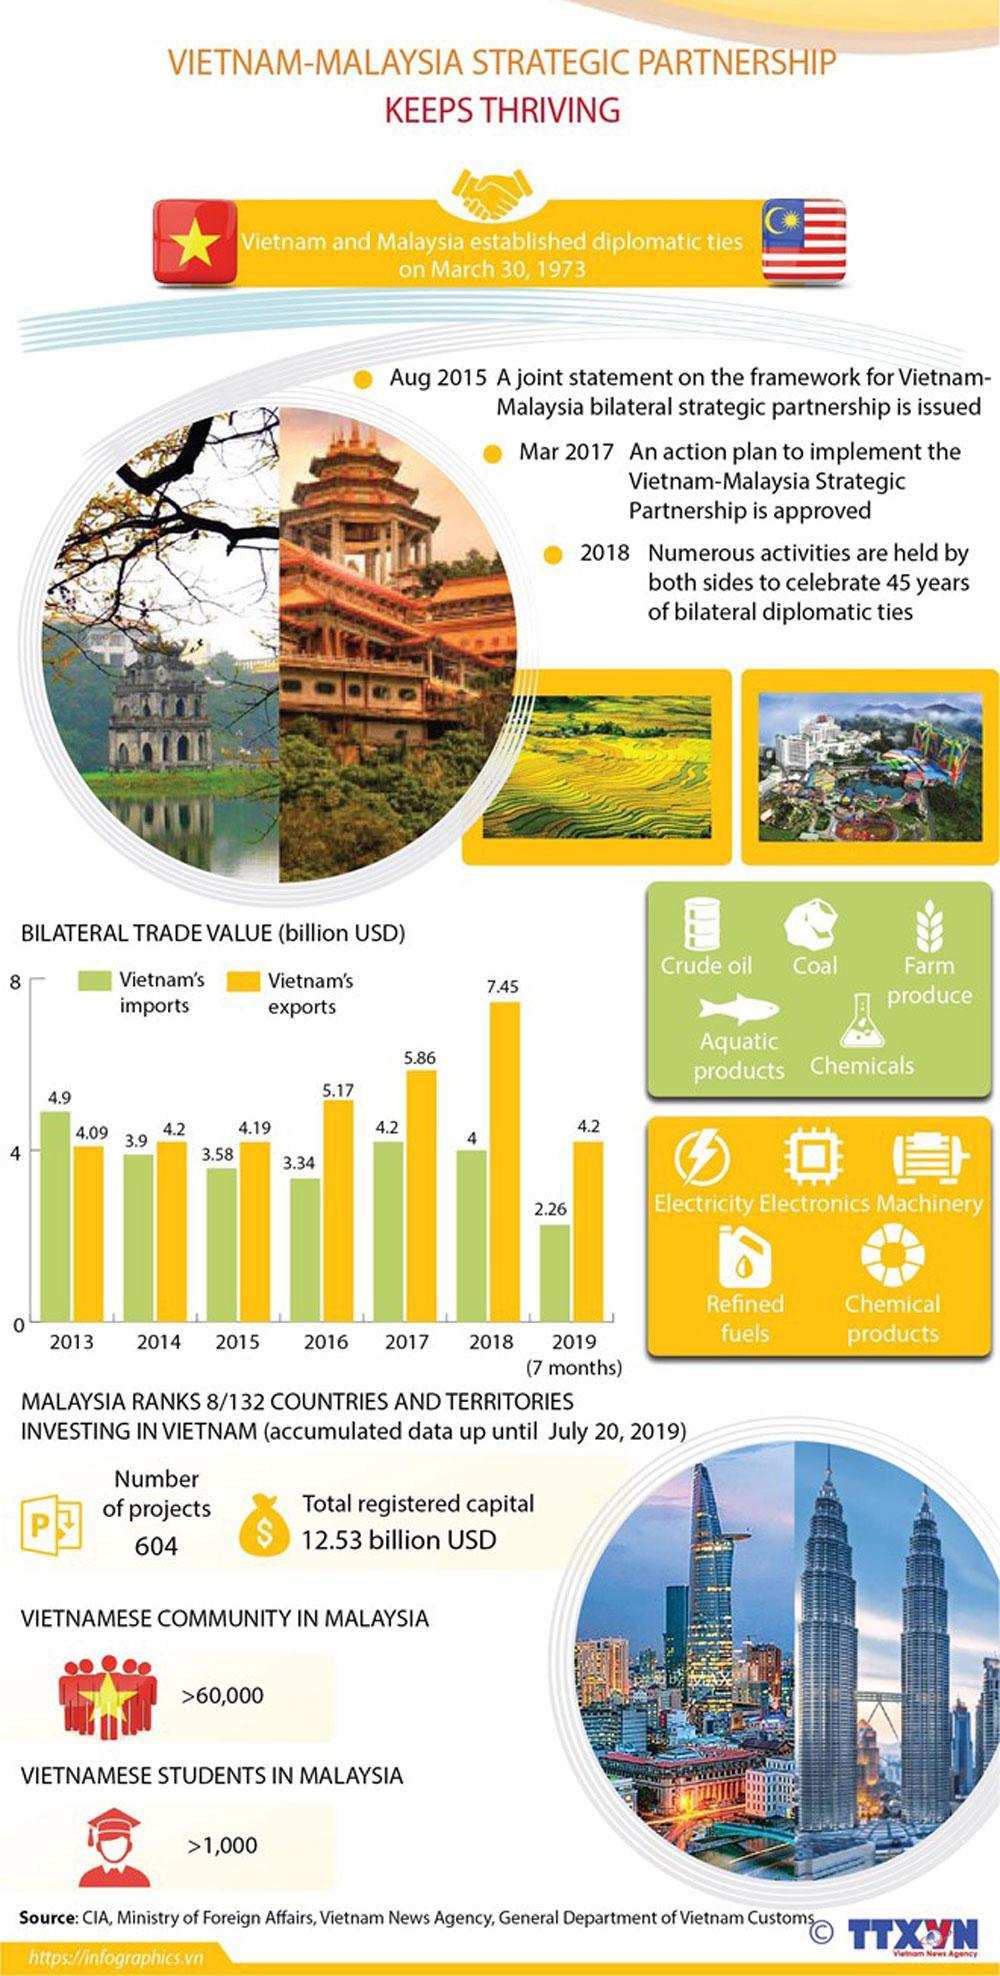 Vietnam-Malaysia, strategic partnership, Vietnamese community, bilateral trade value